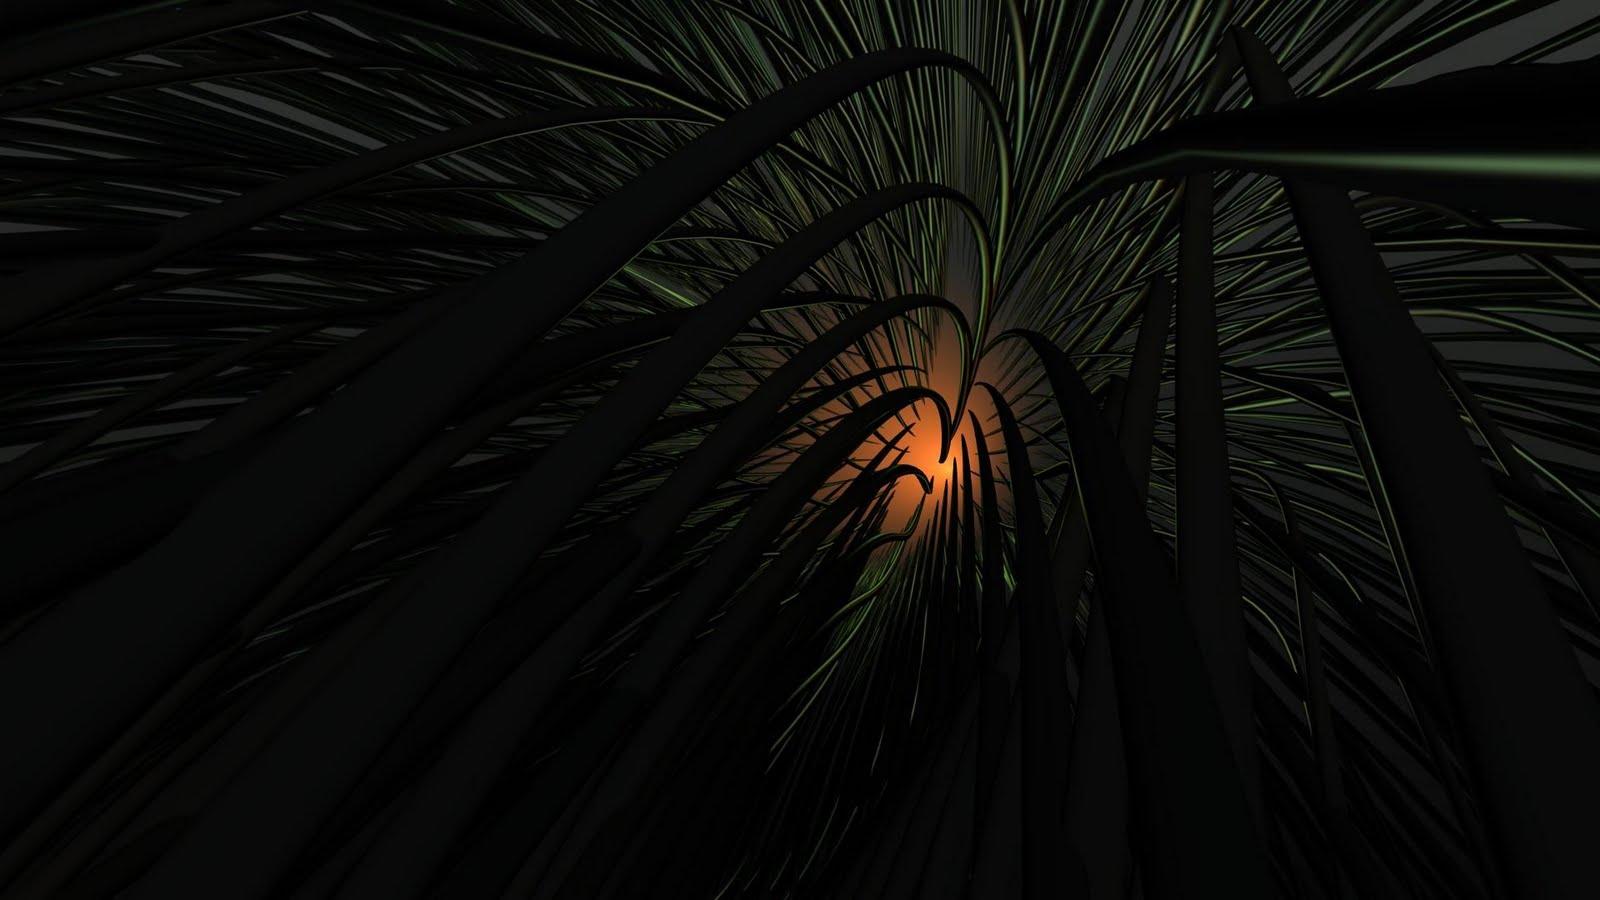 http://3.bp.blogspot.com/_euRtaEmNtFo/TFaqlsJwjKI/AAAAAAAAA8k/BCCQ3wuAsfc/s1600/wallpaper-hd+image.jpg